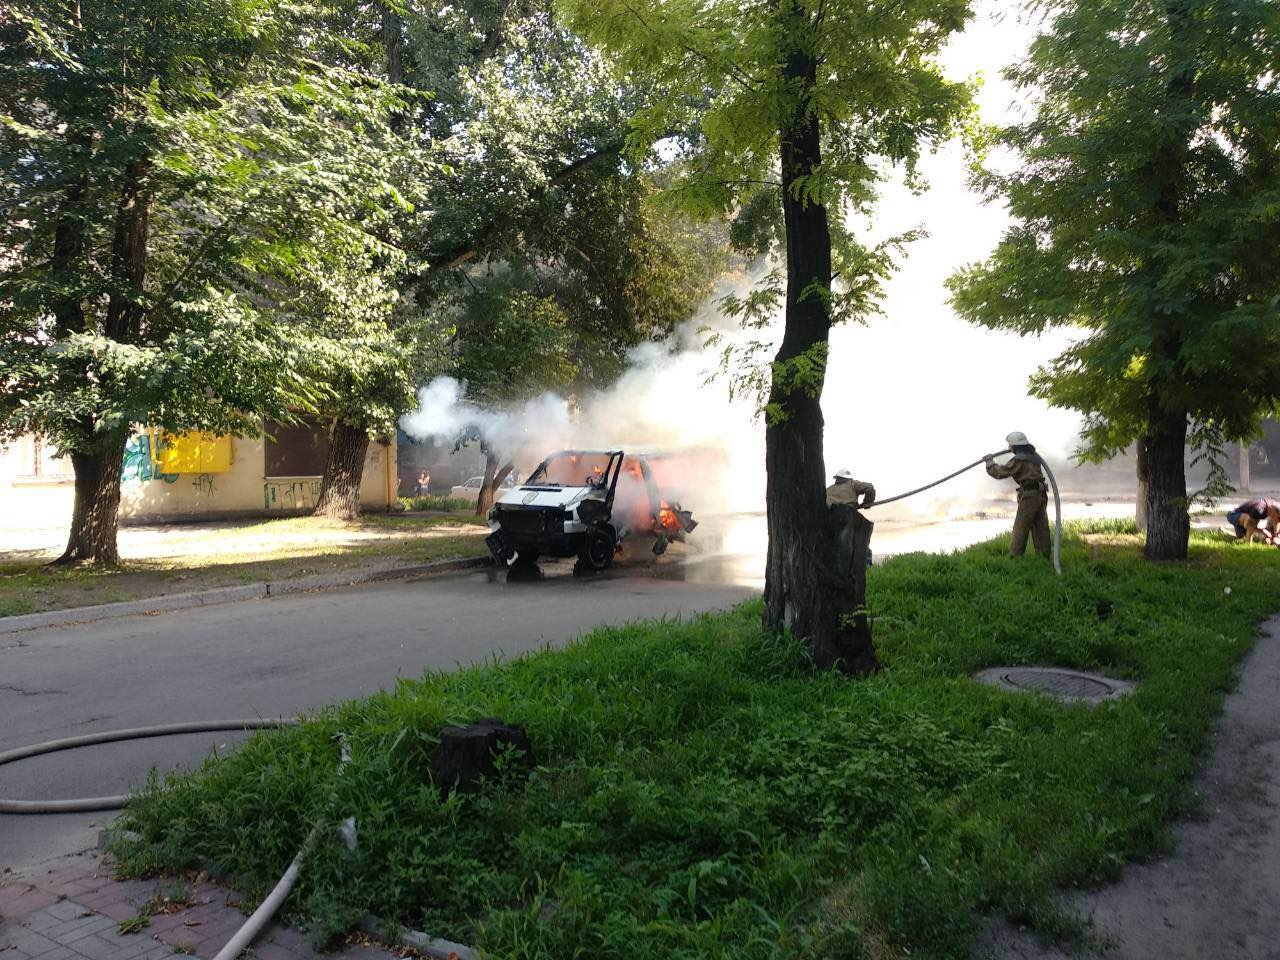 В Днепропетровской области взорвали машину: внутри находился депутат горсовета, - ФОТО, фото-2